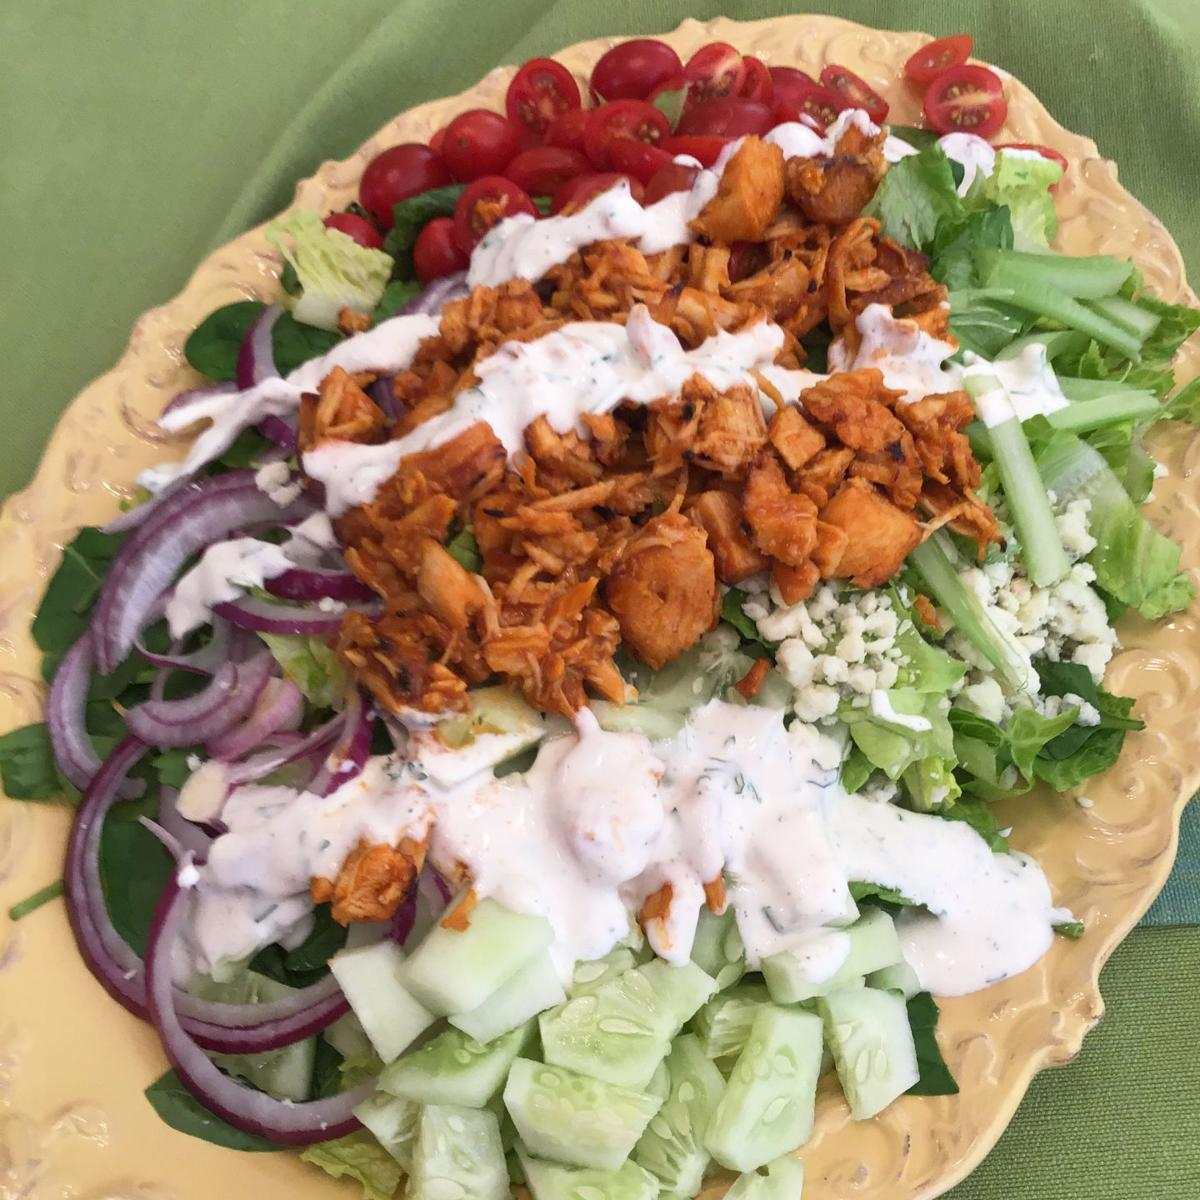 Linda's Summer Salad with Chicken